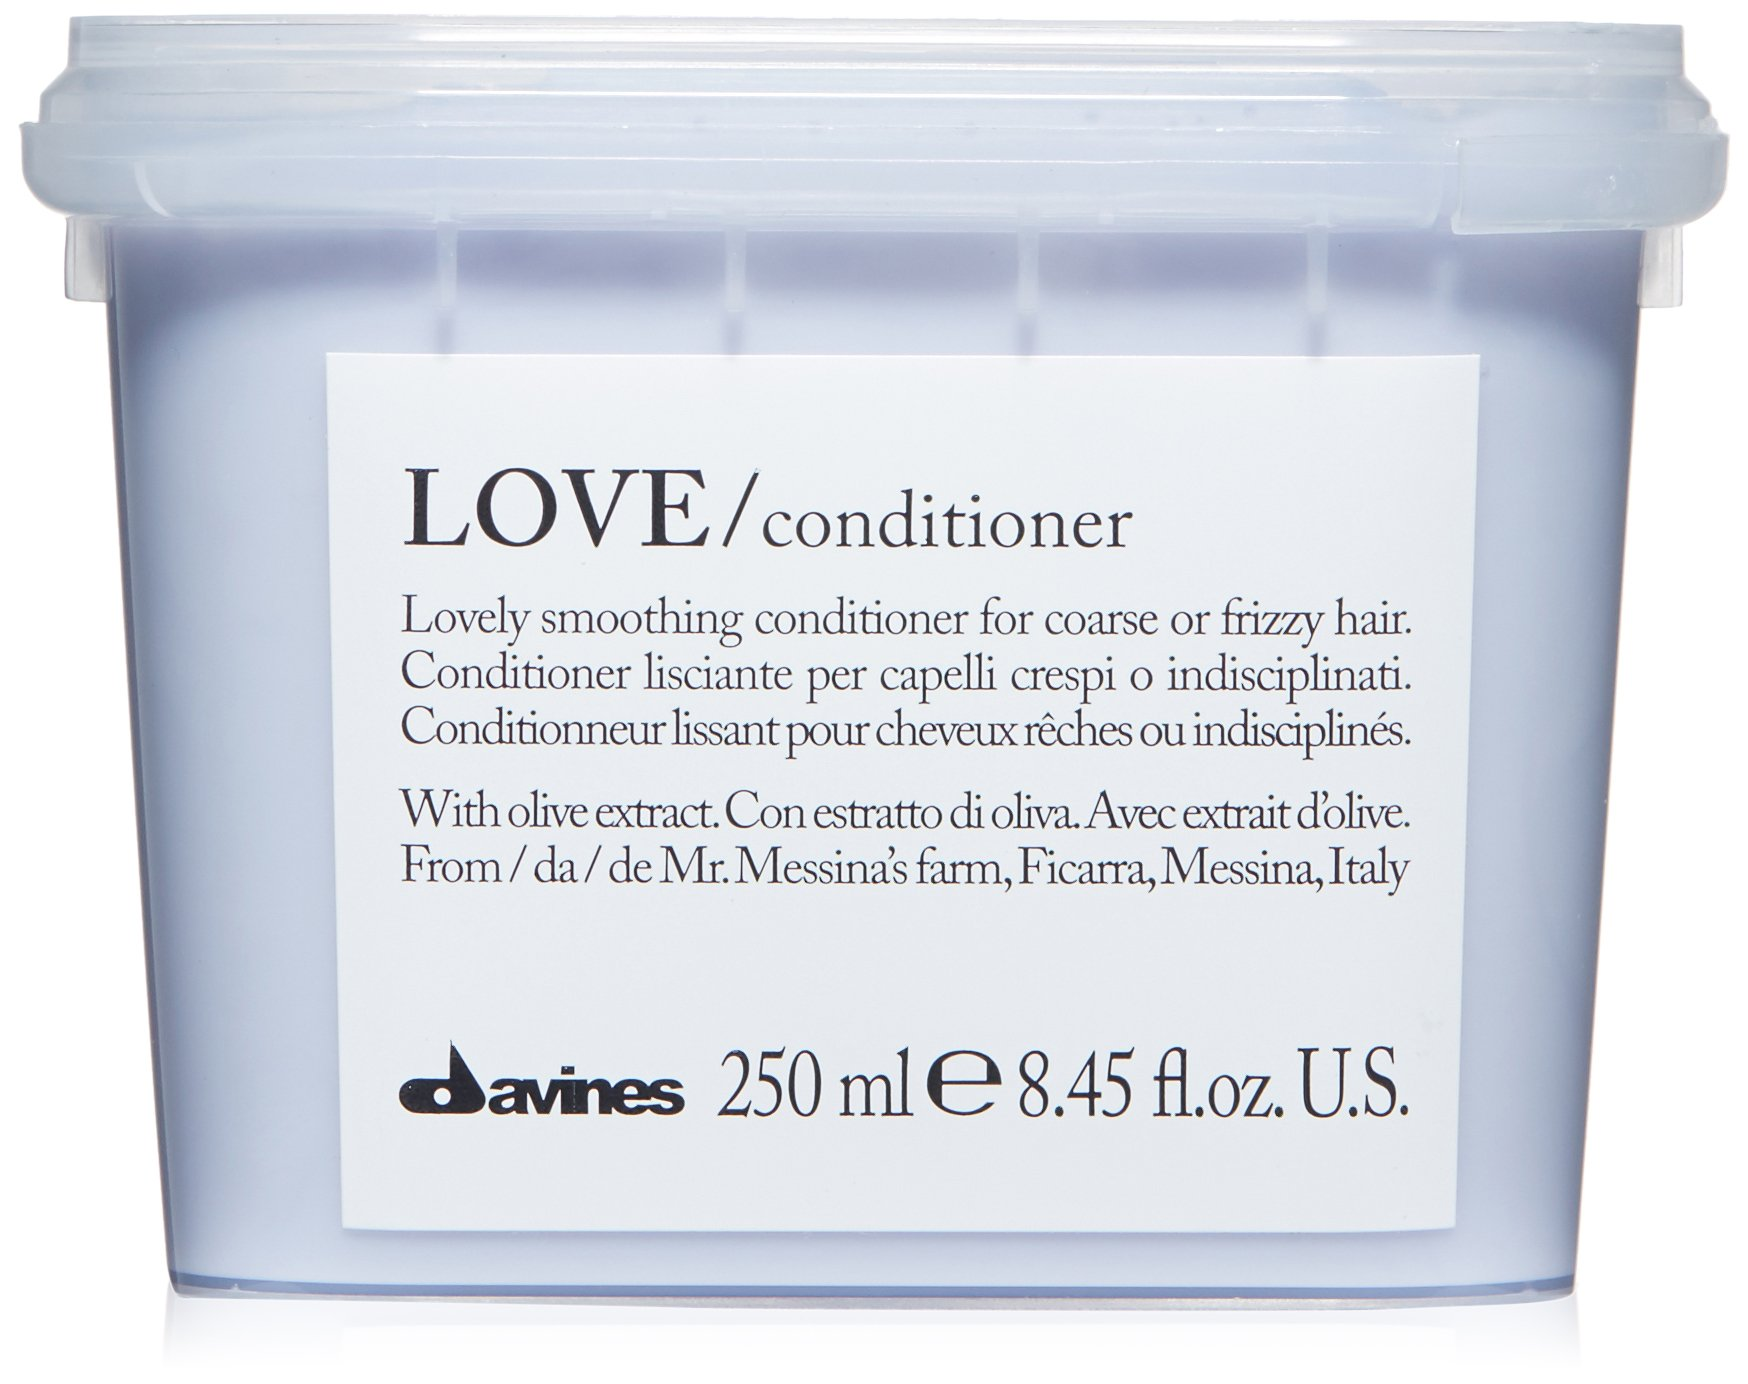 Davines Love Smoothing Conditioner, 8.45 fl.oz. by Davines